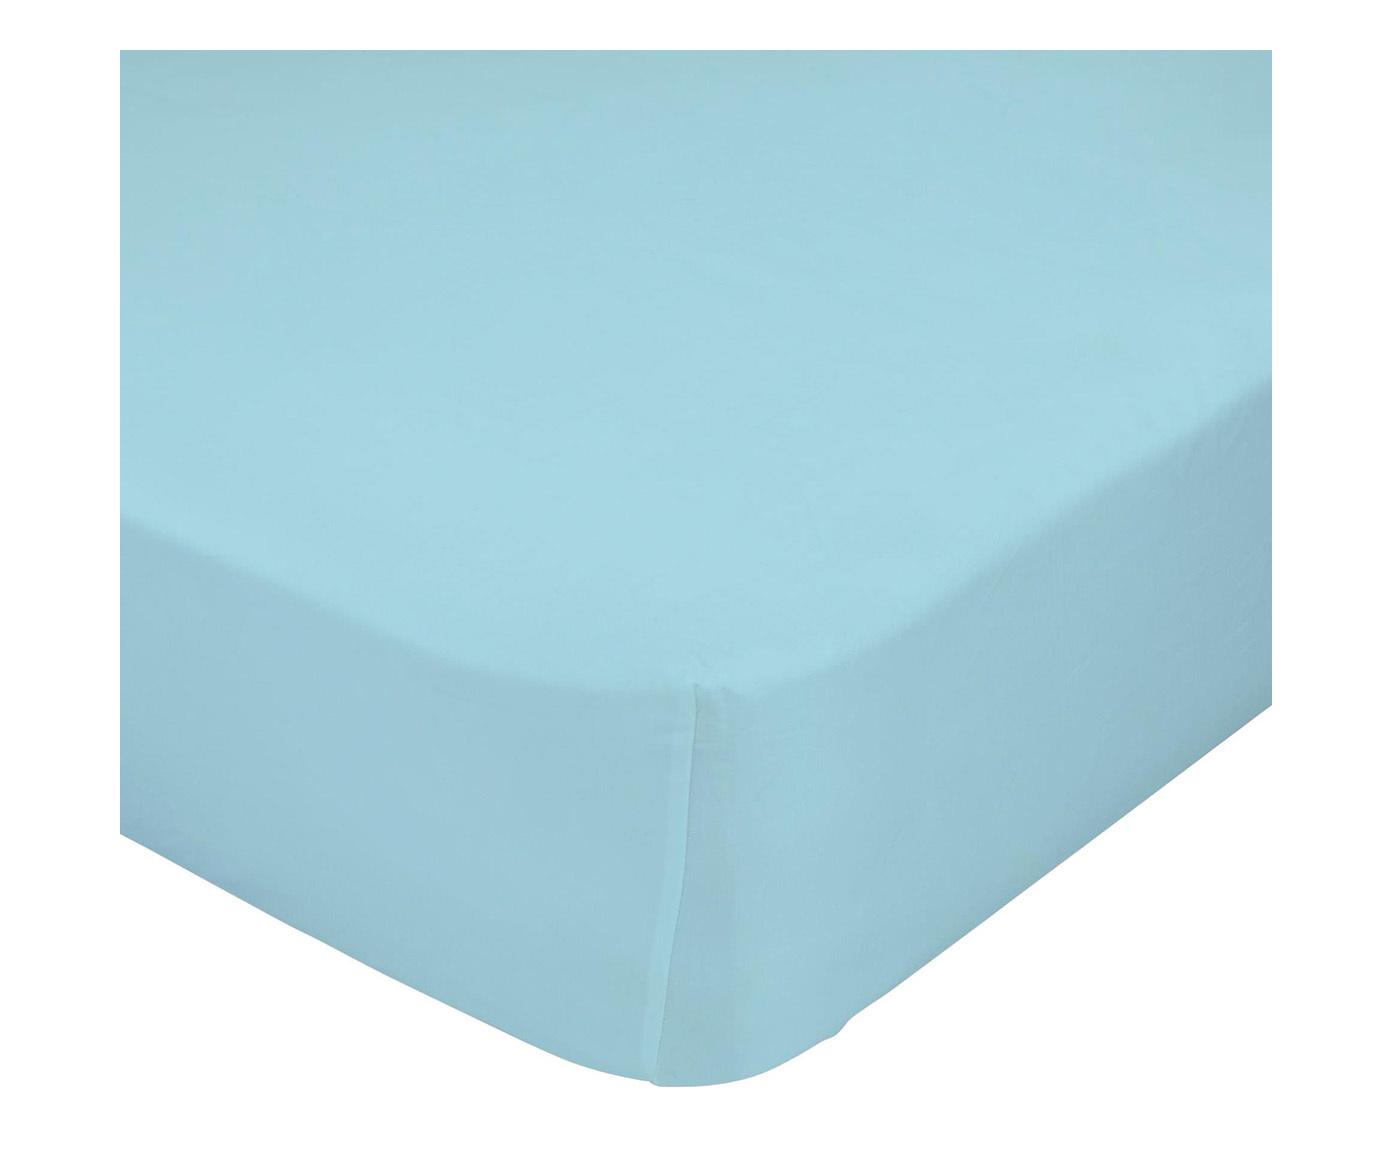 Простыня на резинке BasicДвуспальные комплекты постельного белья<br>Размер: 180х200 см.<br><br>kit: None<br>gender: None